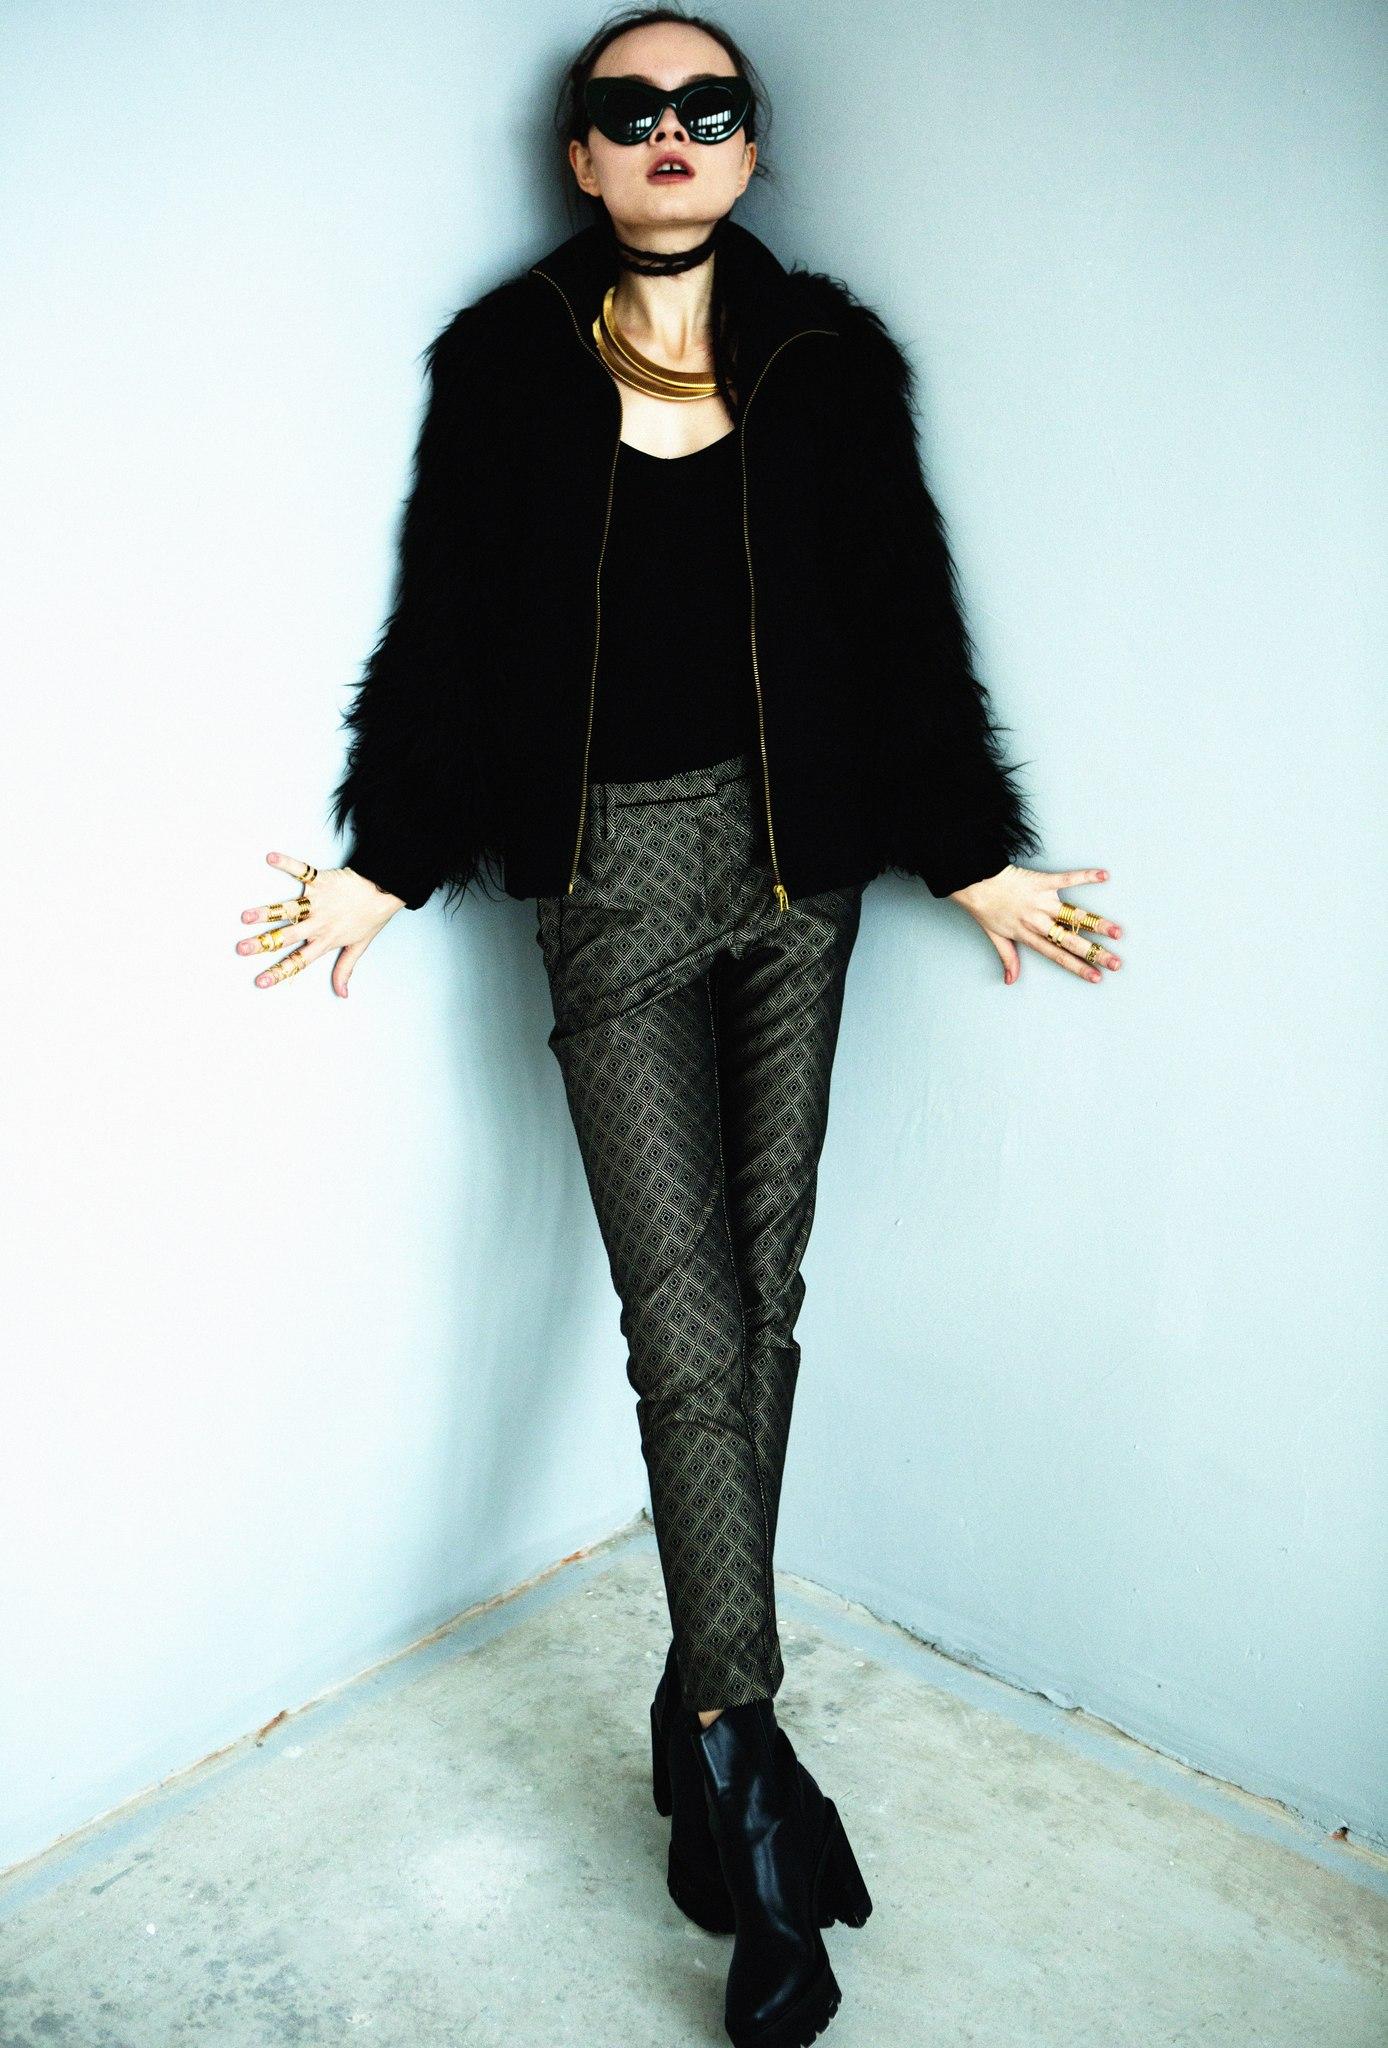 Жакет Zara, брюки Mango, боди Intimissimi, обувь Stella McCartney, очки Celine, колье Poisondrop, кольца на верхние и нижние фаланги пальцев LeiVanKash, Poisondrop